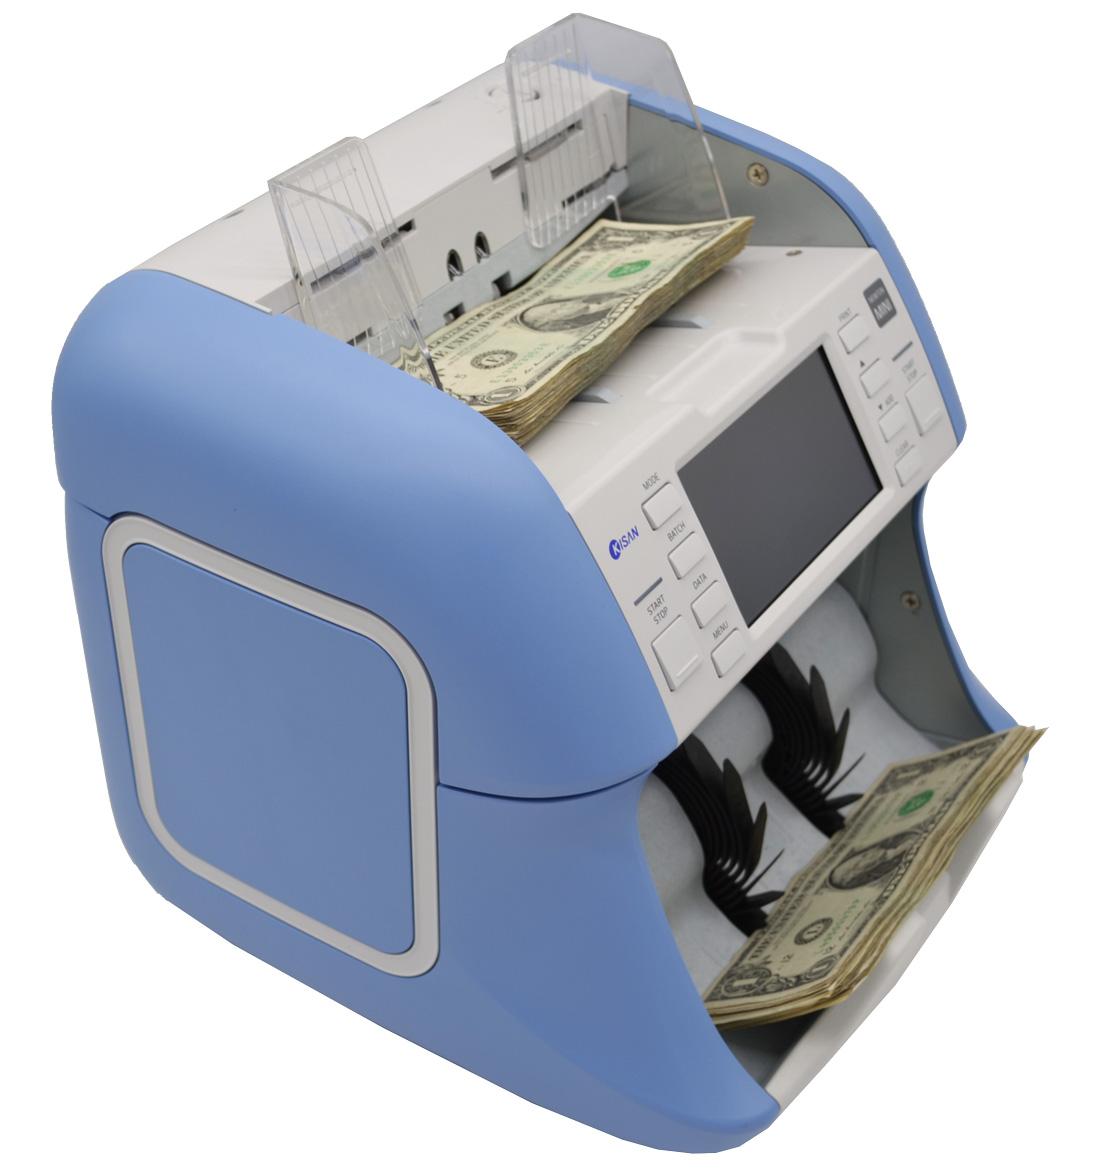 Kisan Newton Mini Dual CIS Currency Counter